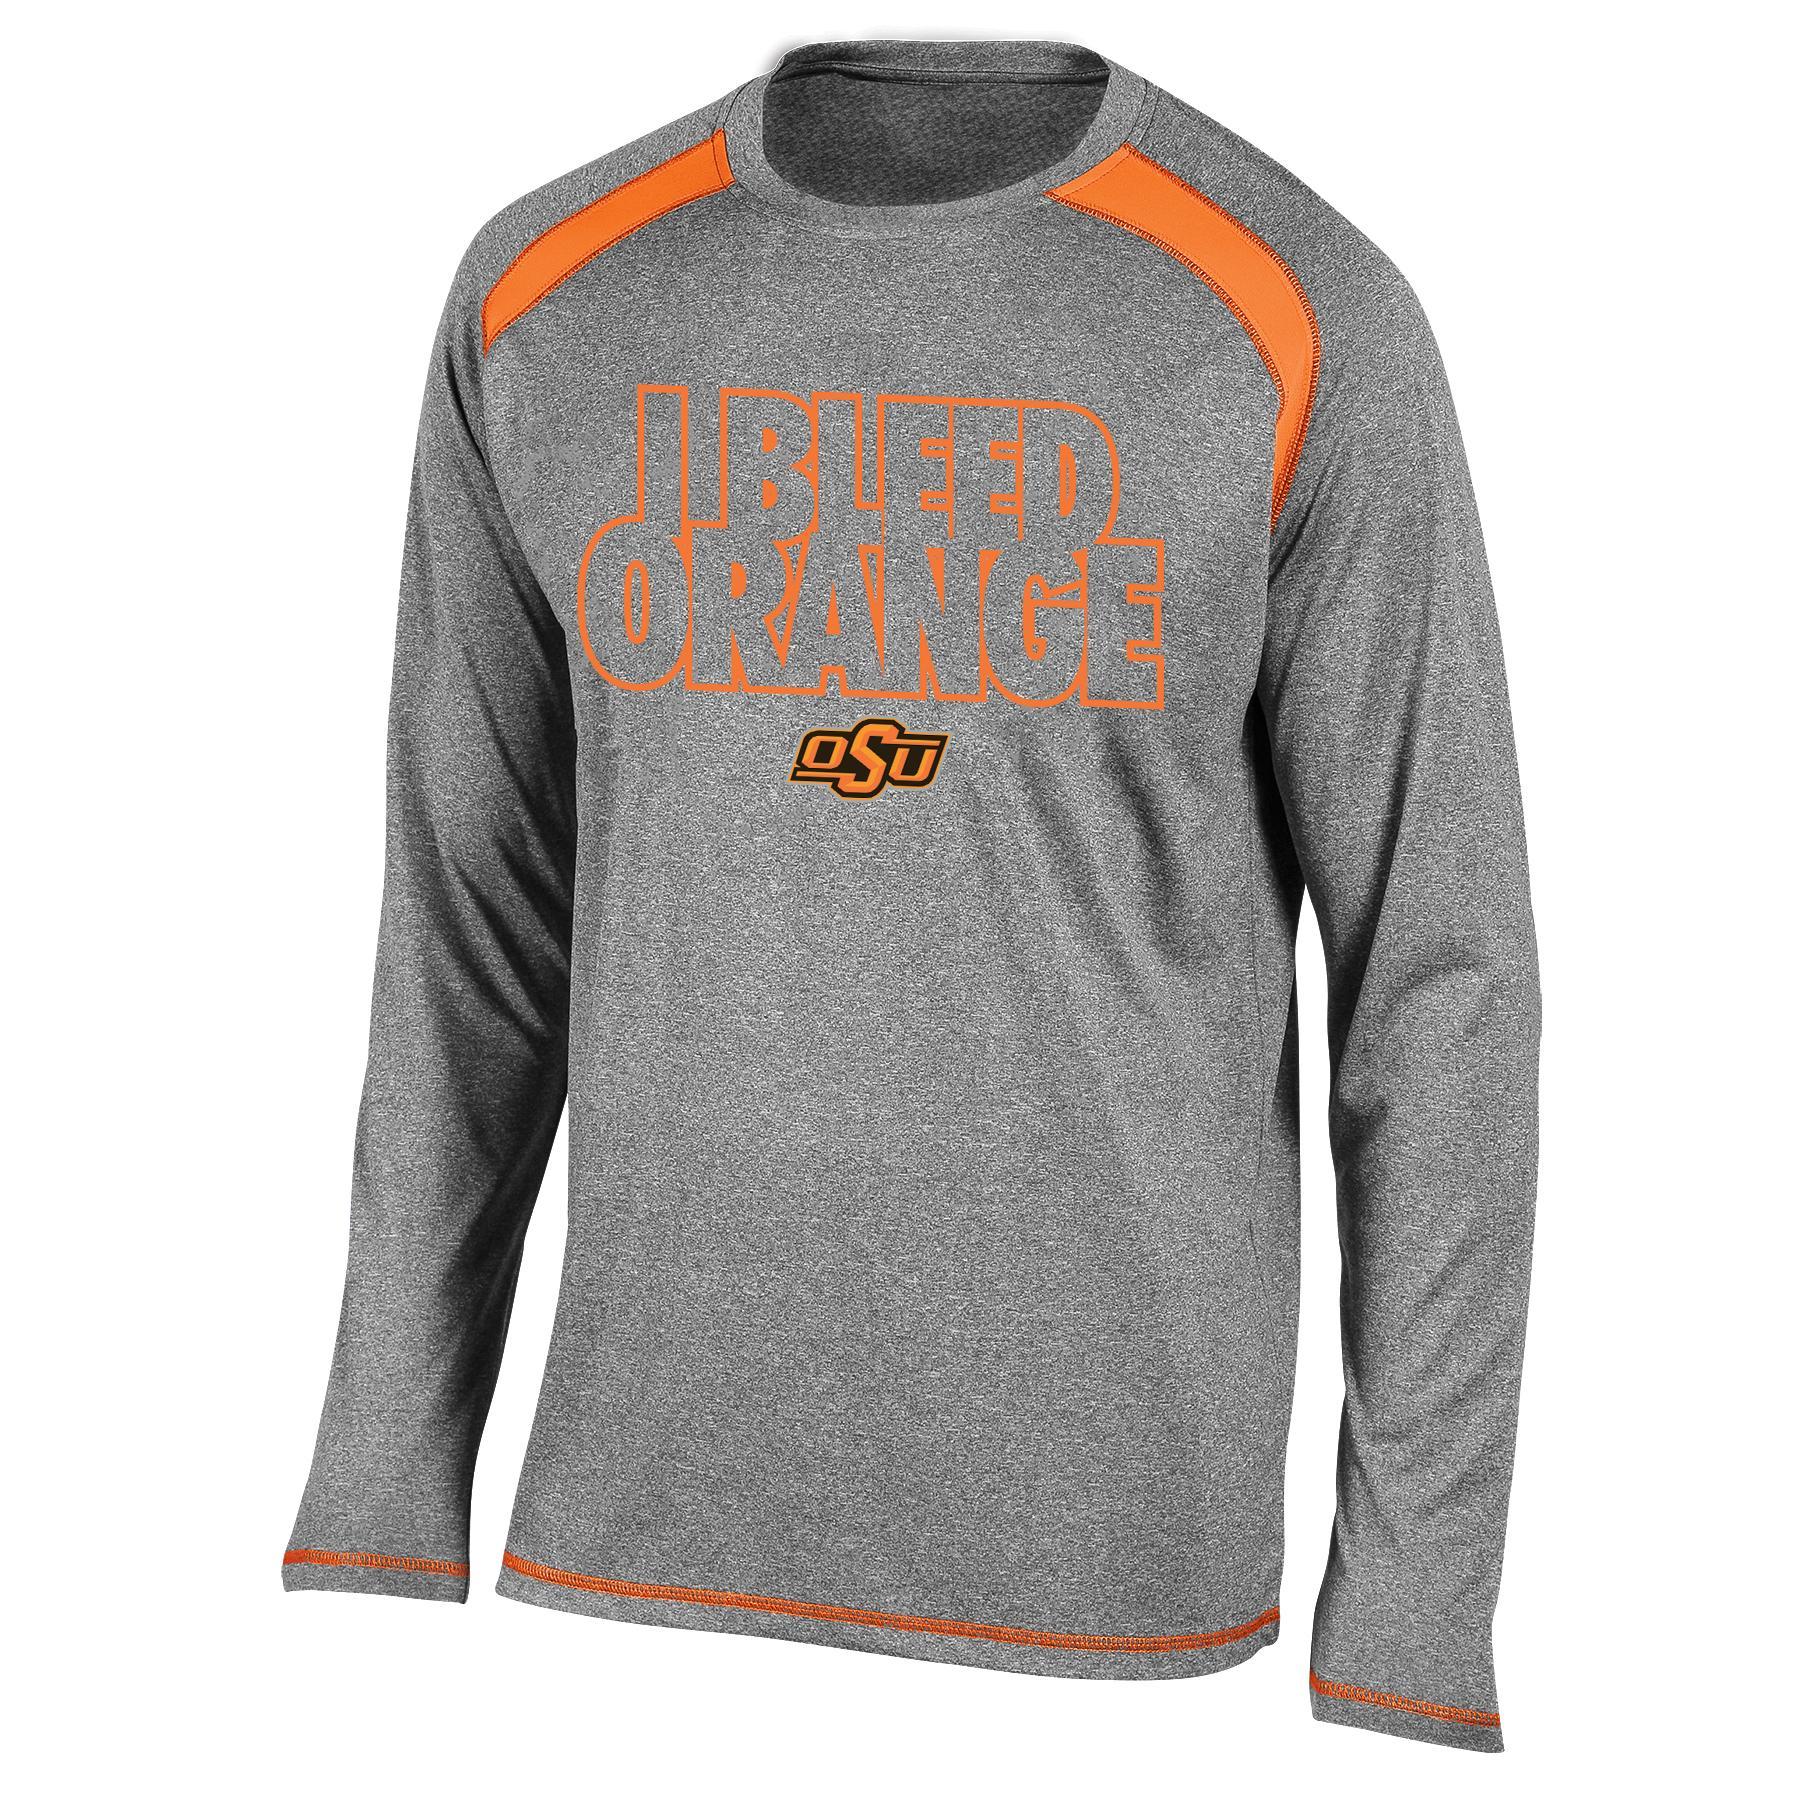 NCAA Men's Big & Tall Athletic Shirt - Oklahoma State University Cowboys PartNumber: 046VA91024212P MfgPartNumber: 7AXHE24KMF